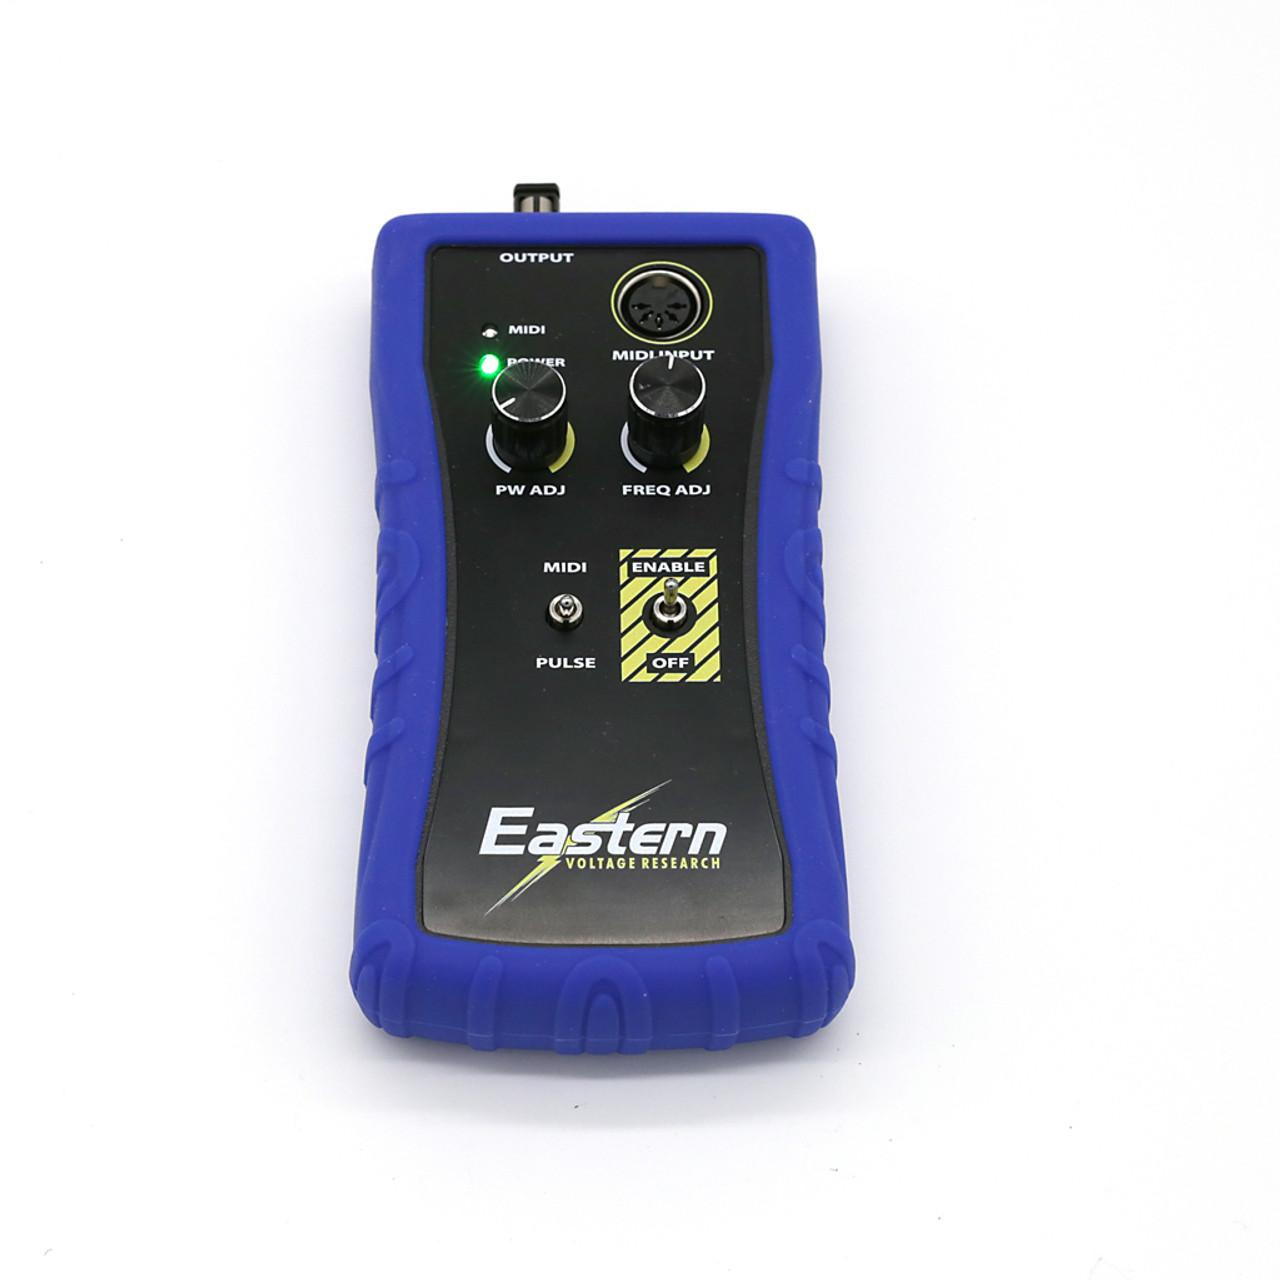 Professional Handheld MIDI Interrupter / Controller